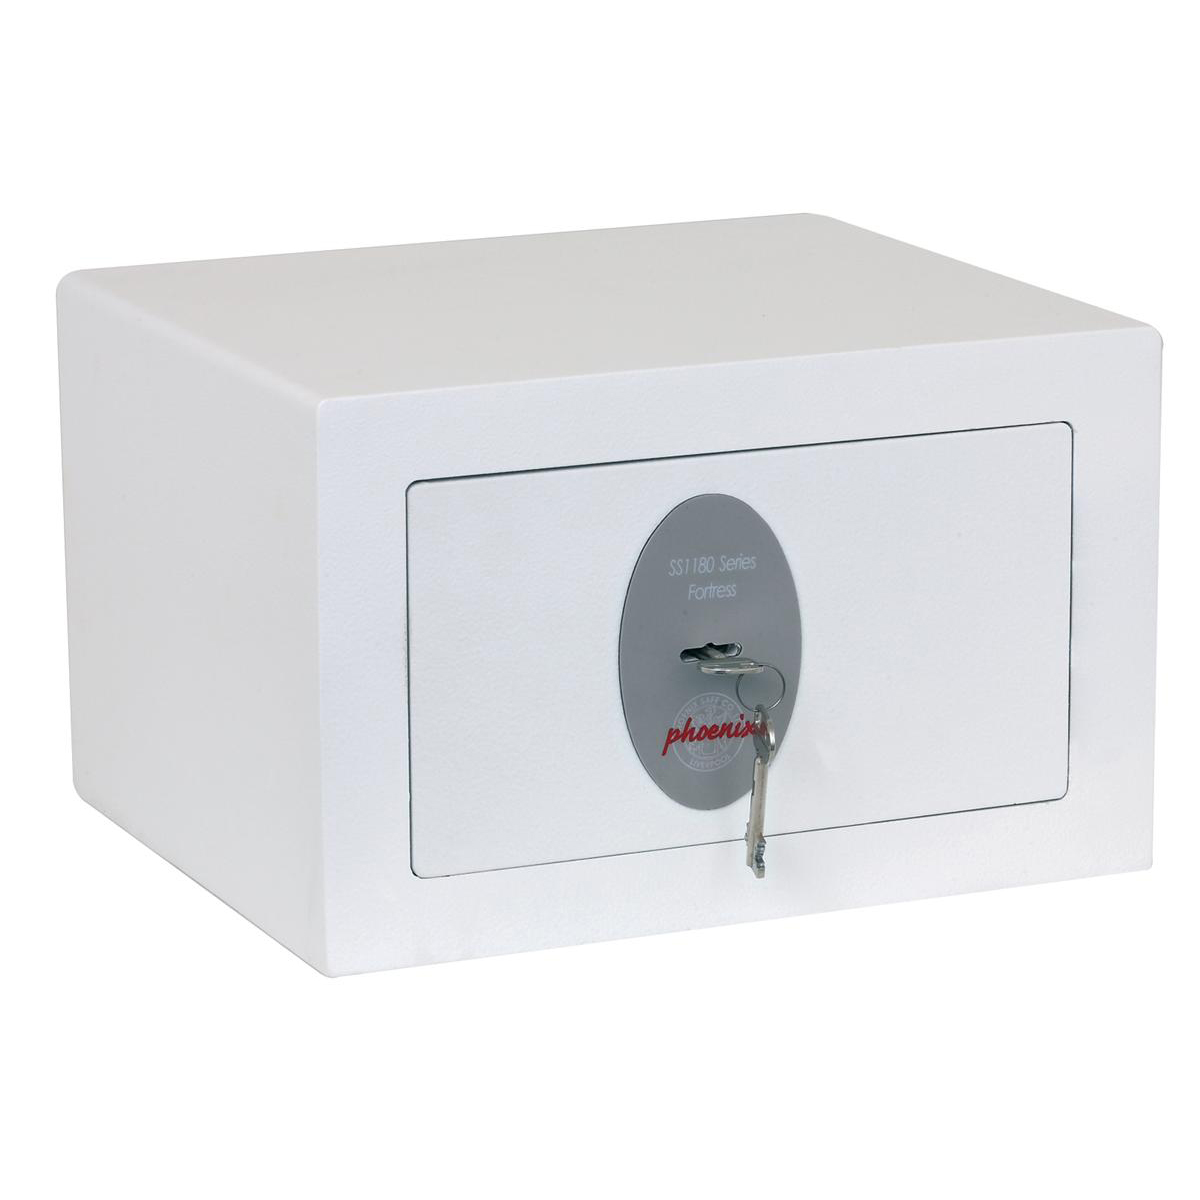 Phoenix Fortress High Security Safe Key Lock 7l Capacity 15kg W350xd300xh220mm Ref Ss1181k